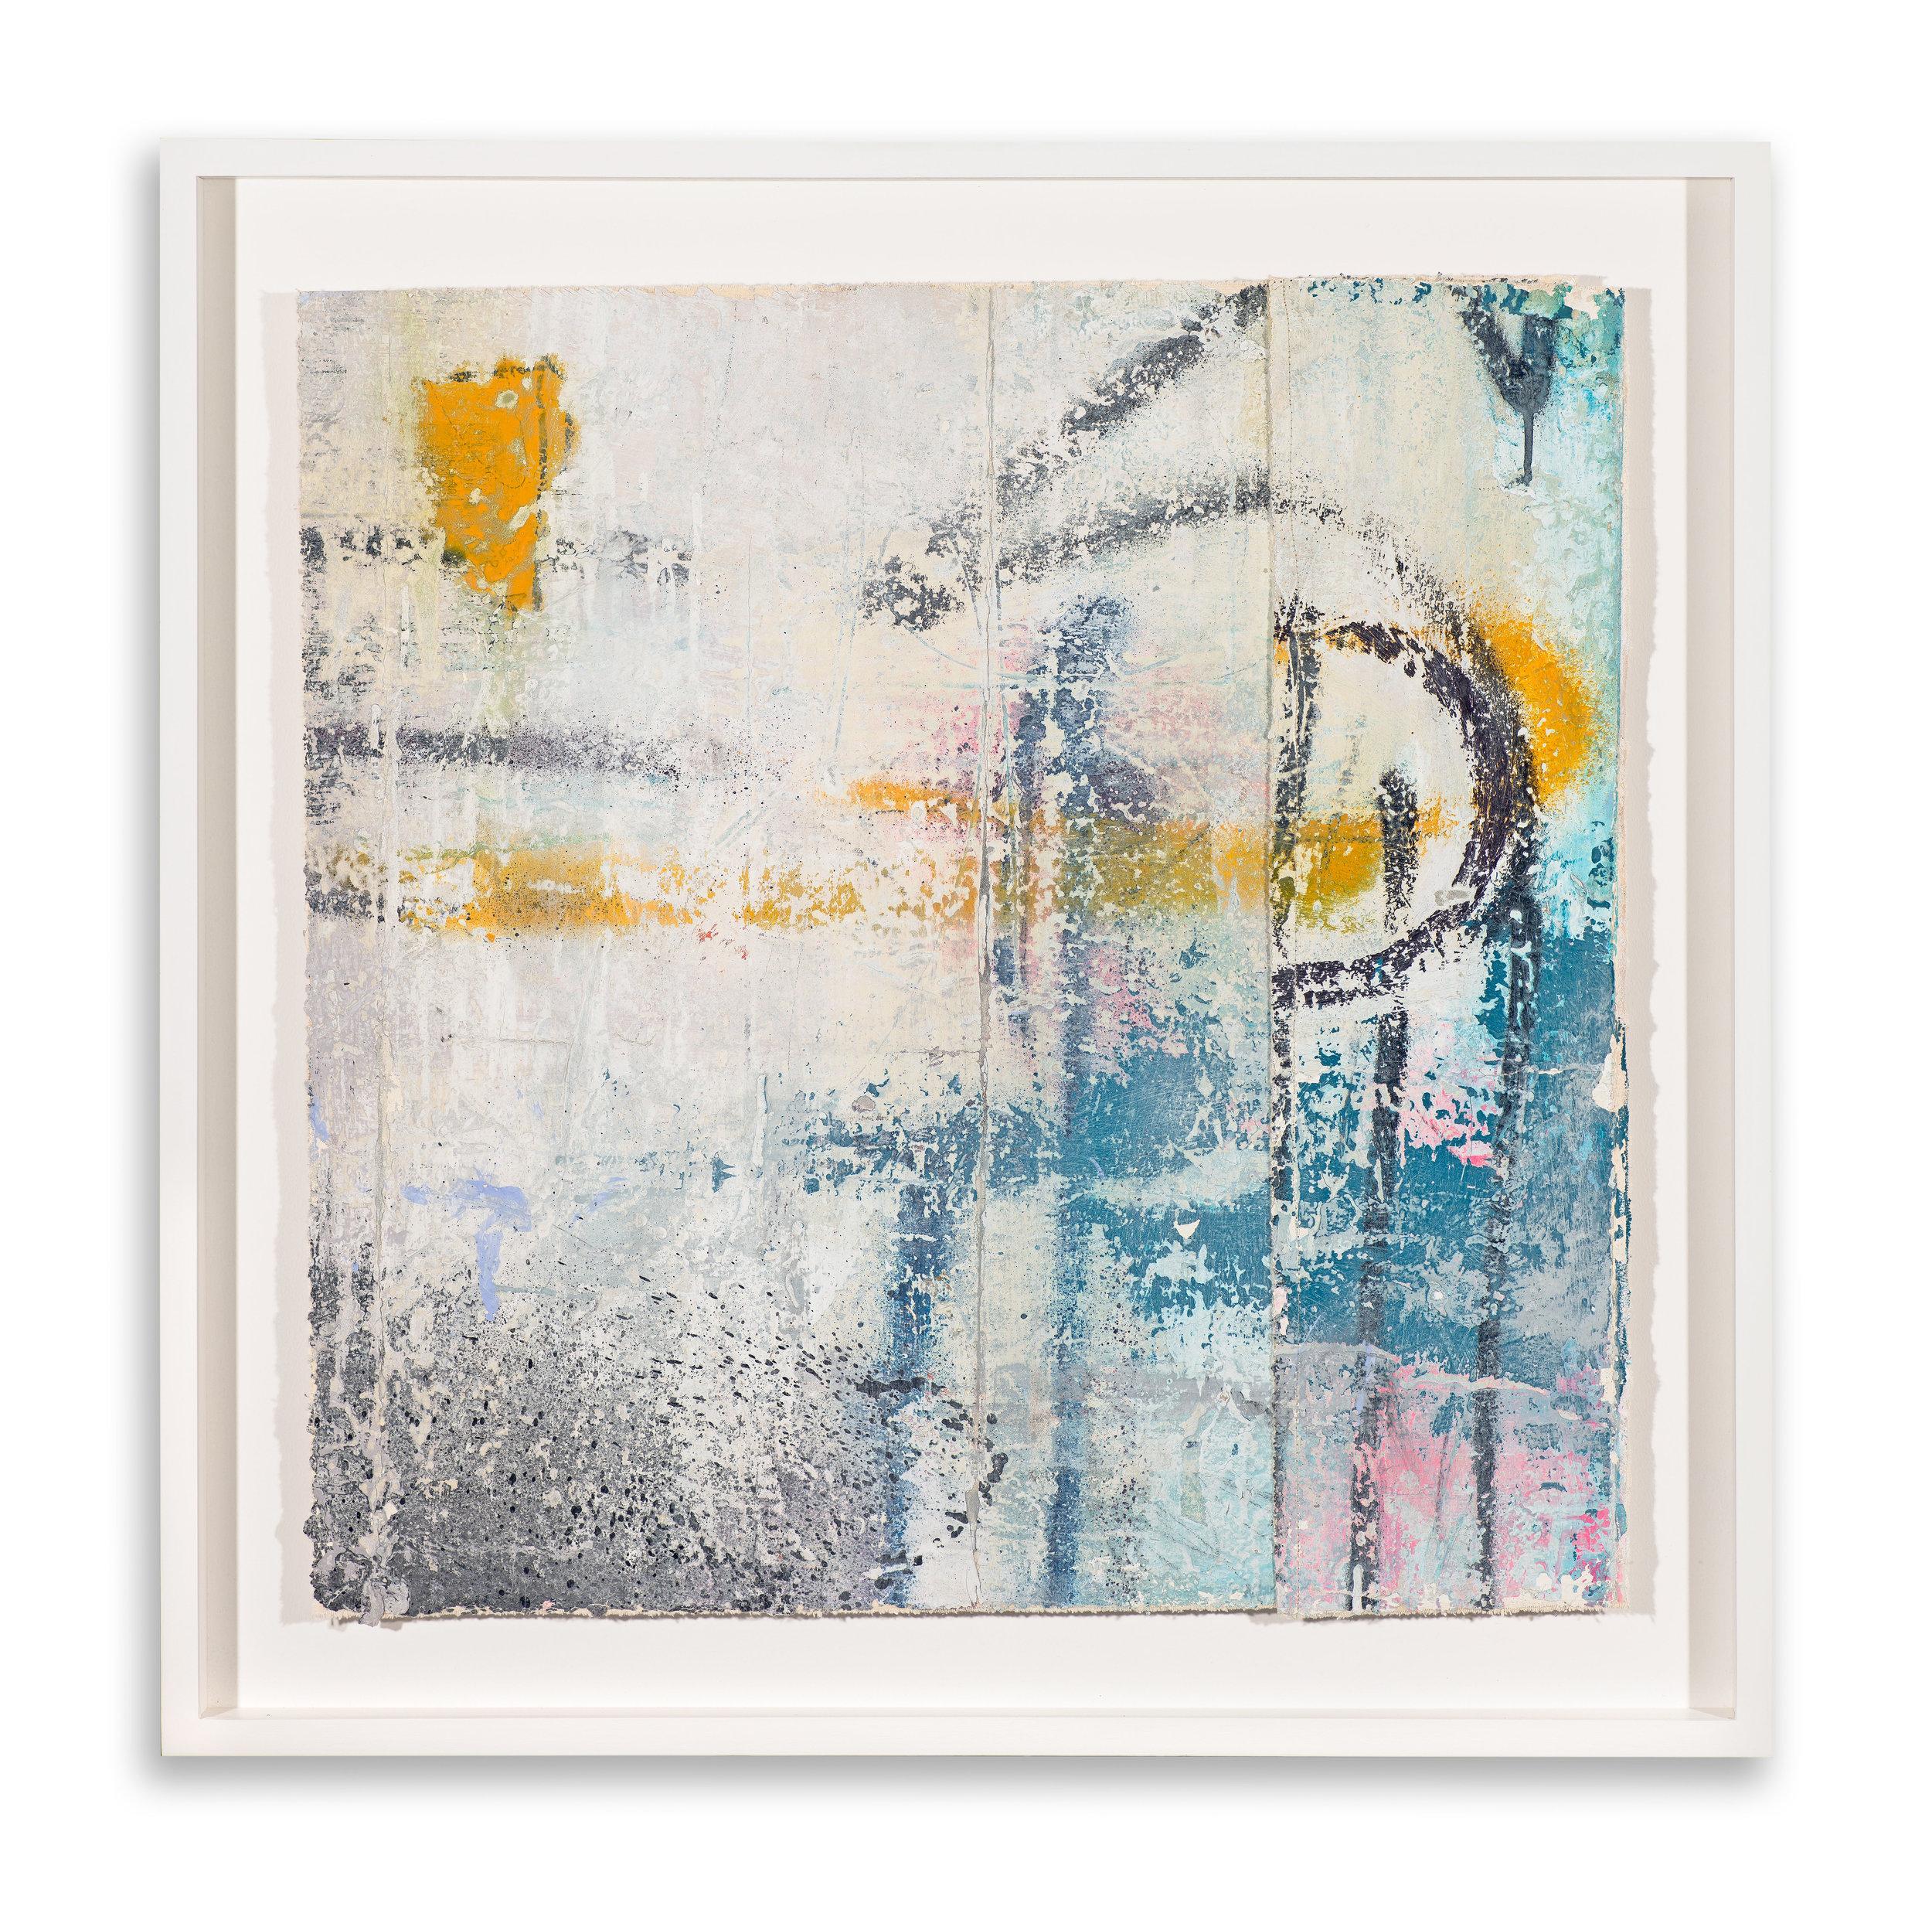 'Quintessence'-painting on canvas, 77.5cm x 77.5cm, £1600.jpg